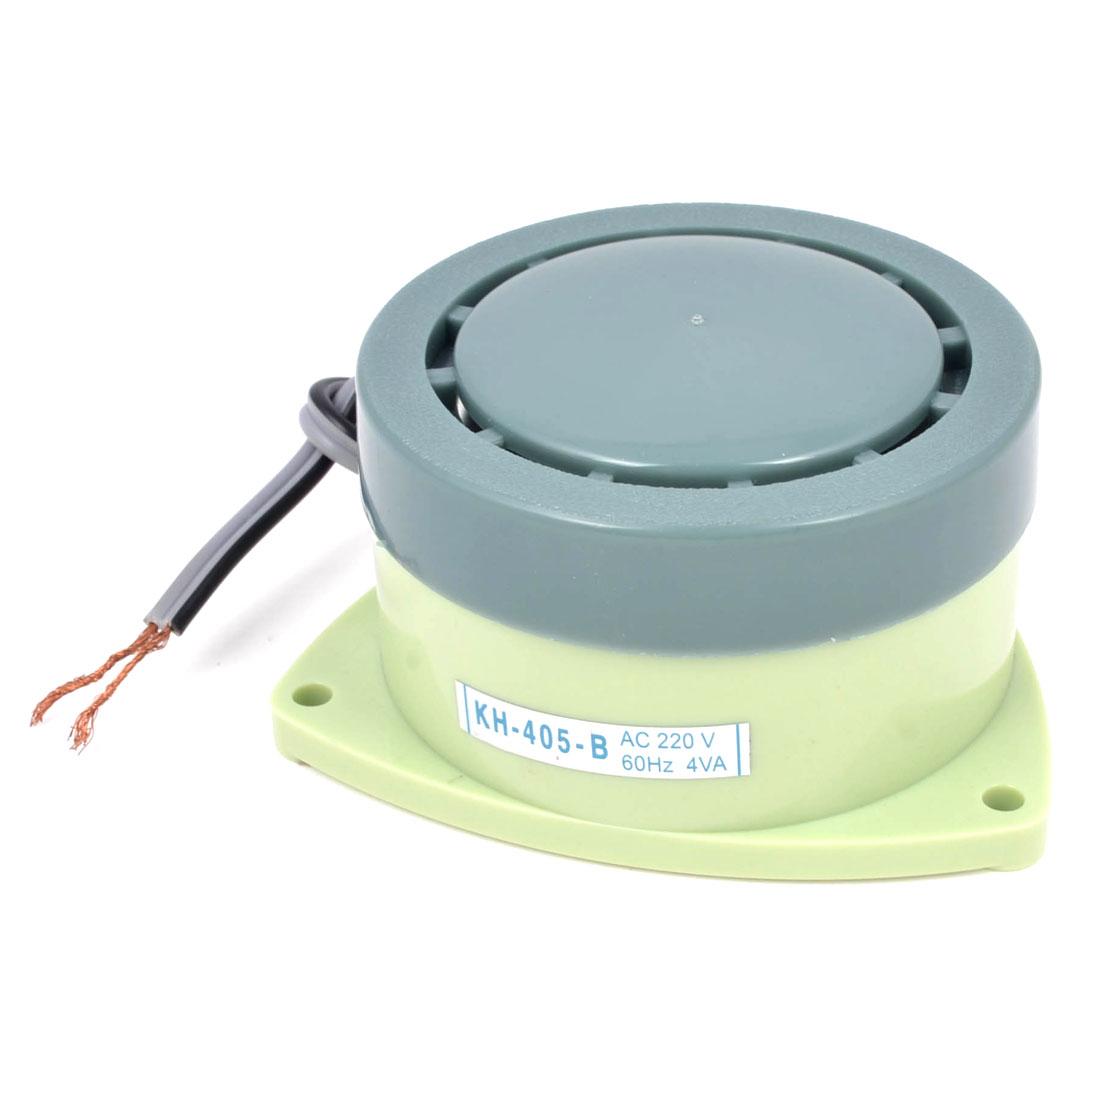 AC 220V 60Hz 4VA Surface Mounting Triangle Buzzer Alarm Light Green Gray